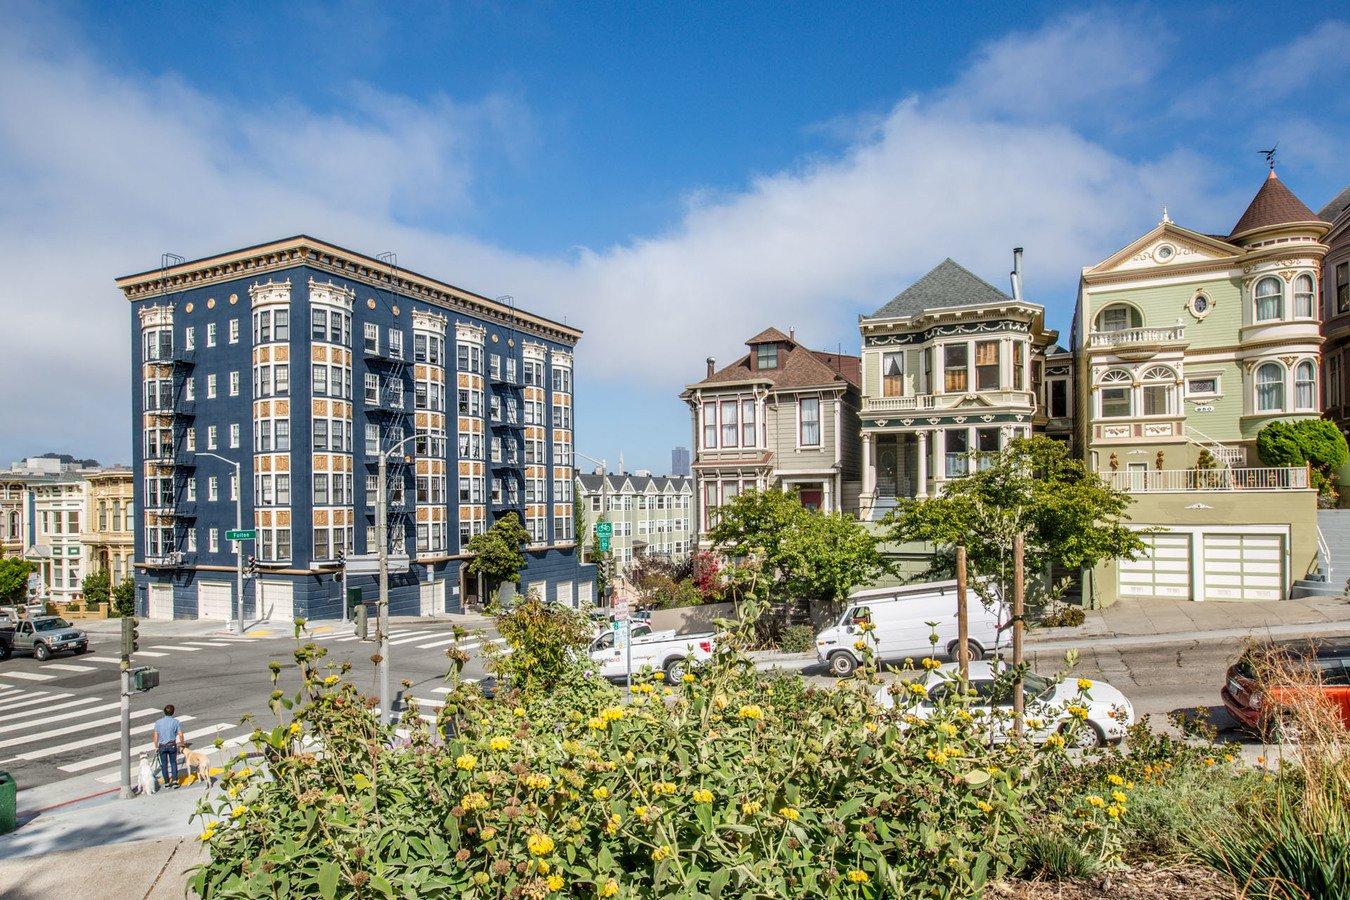 2 Bedrooms 1 Bathroom Apartment for rent at 990 Fulton Apartments in San Francisco, CA